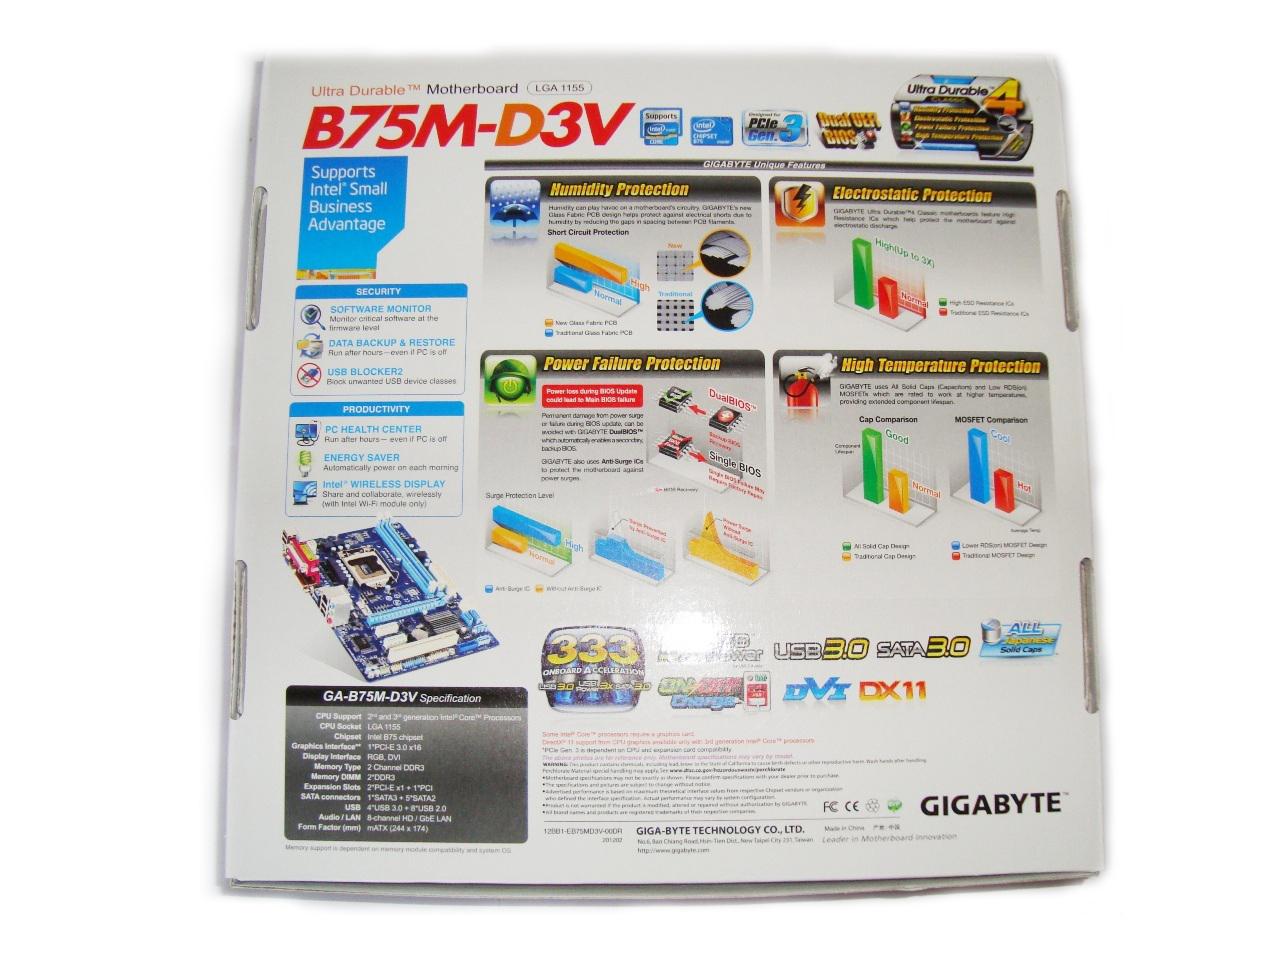 opakowanie Gigabyte B75M-D3V